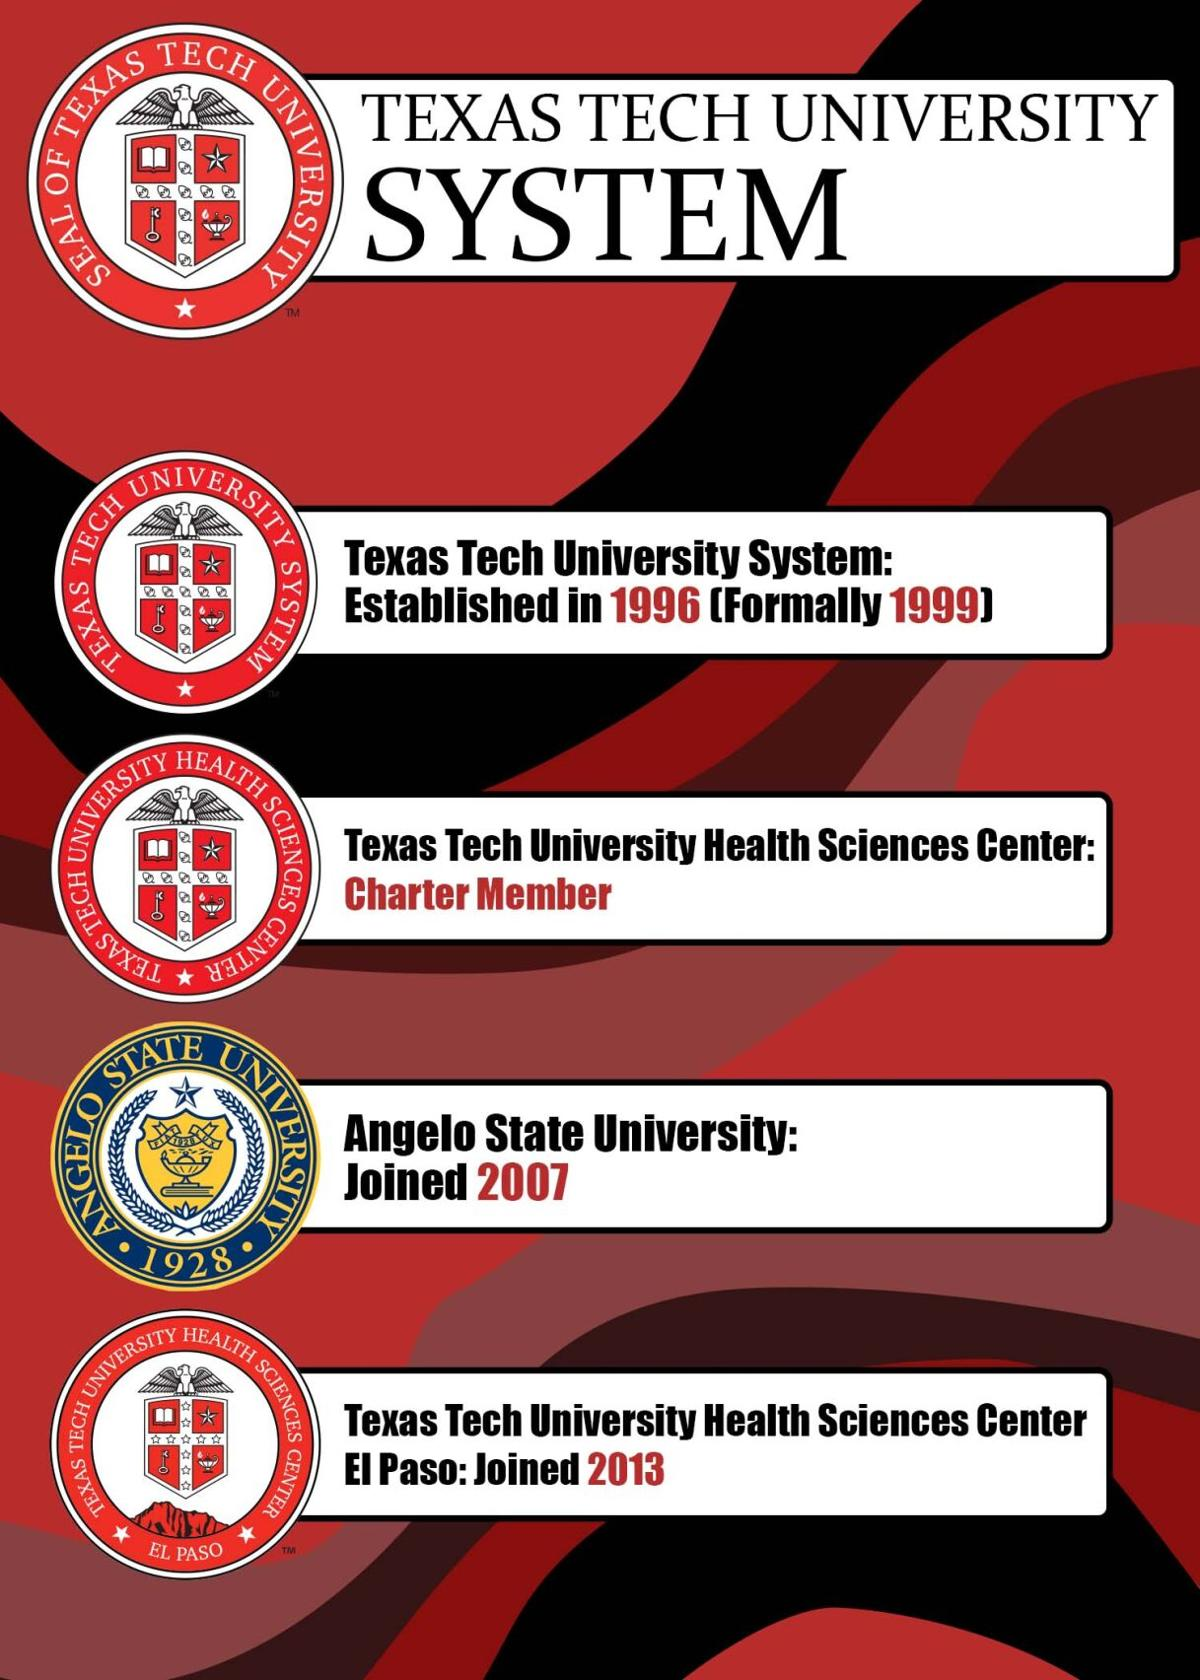 Timeline of Texas Tech University System